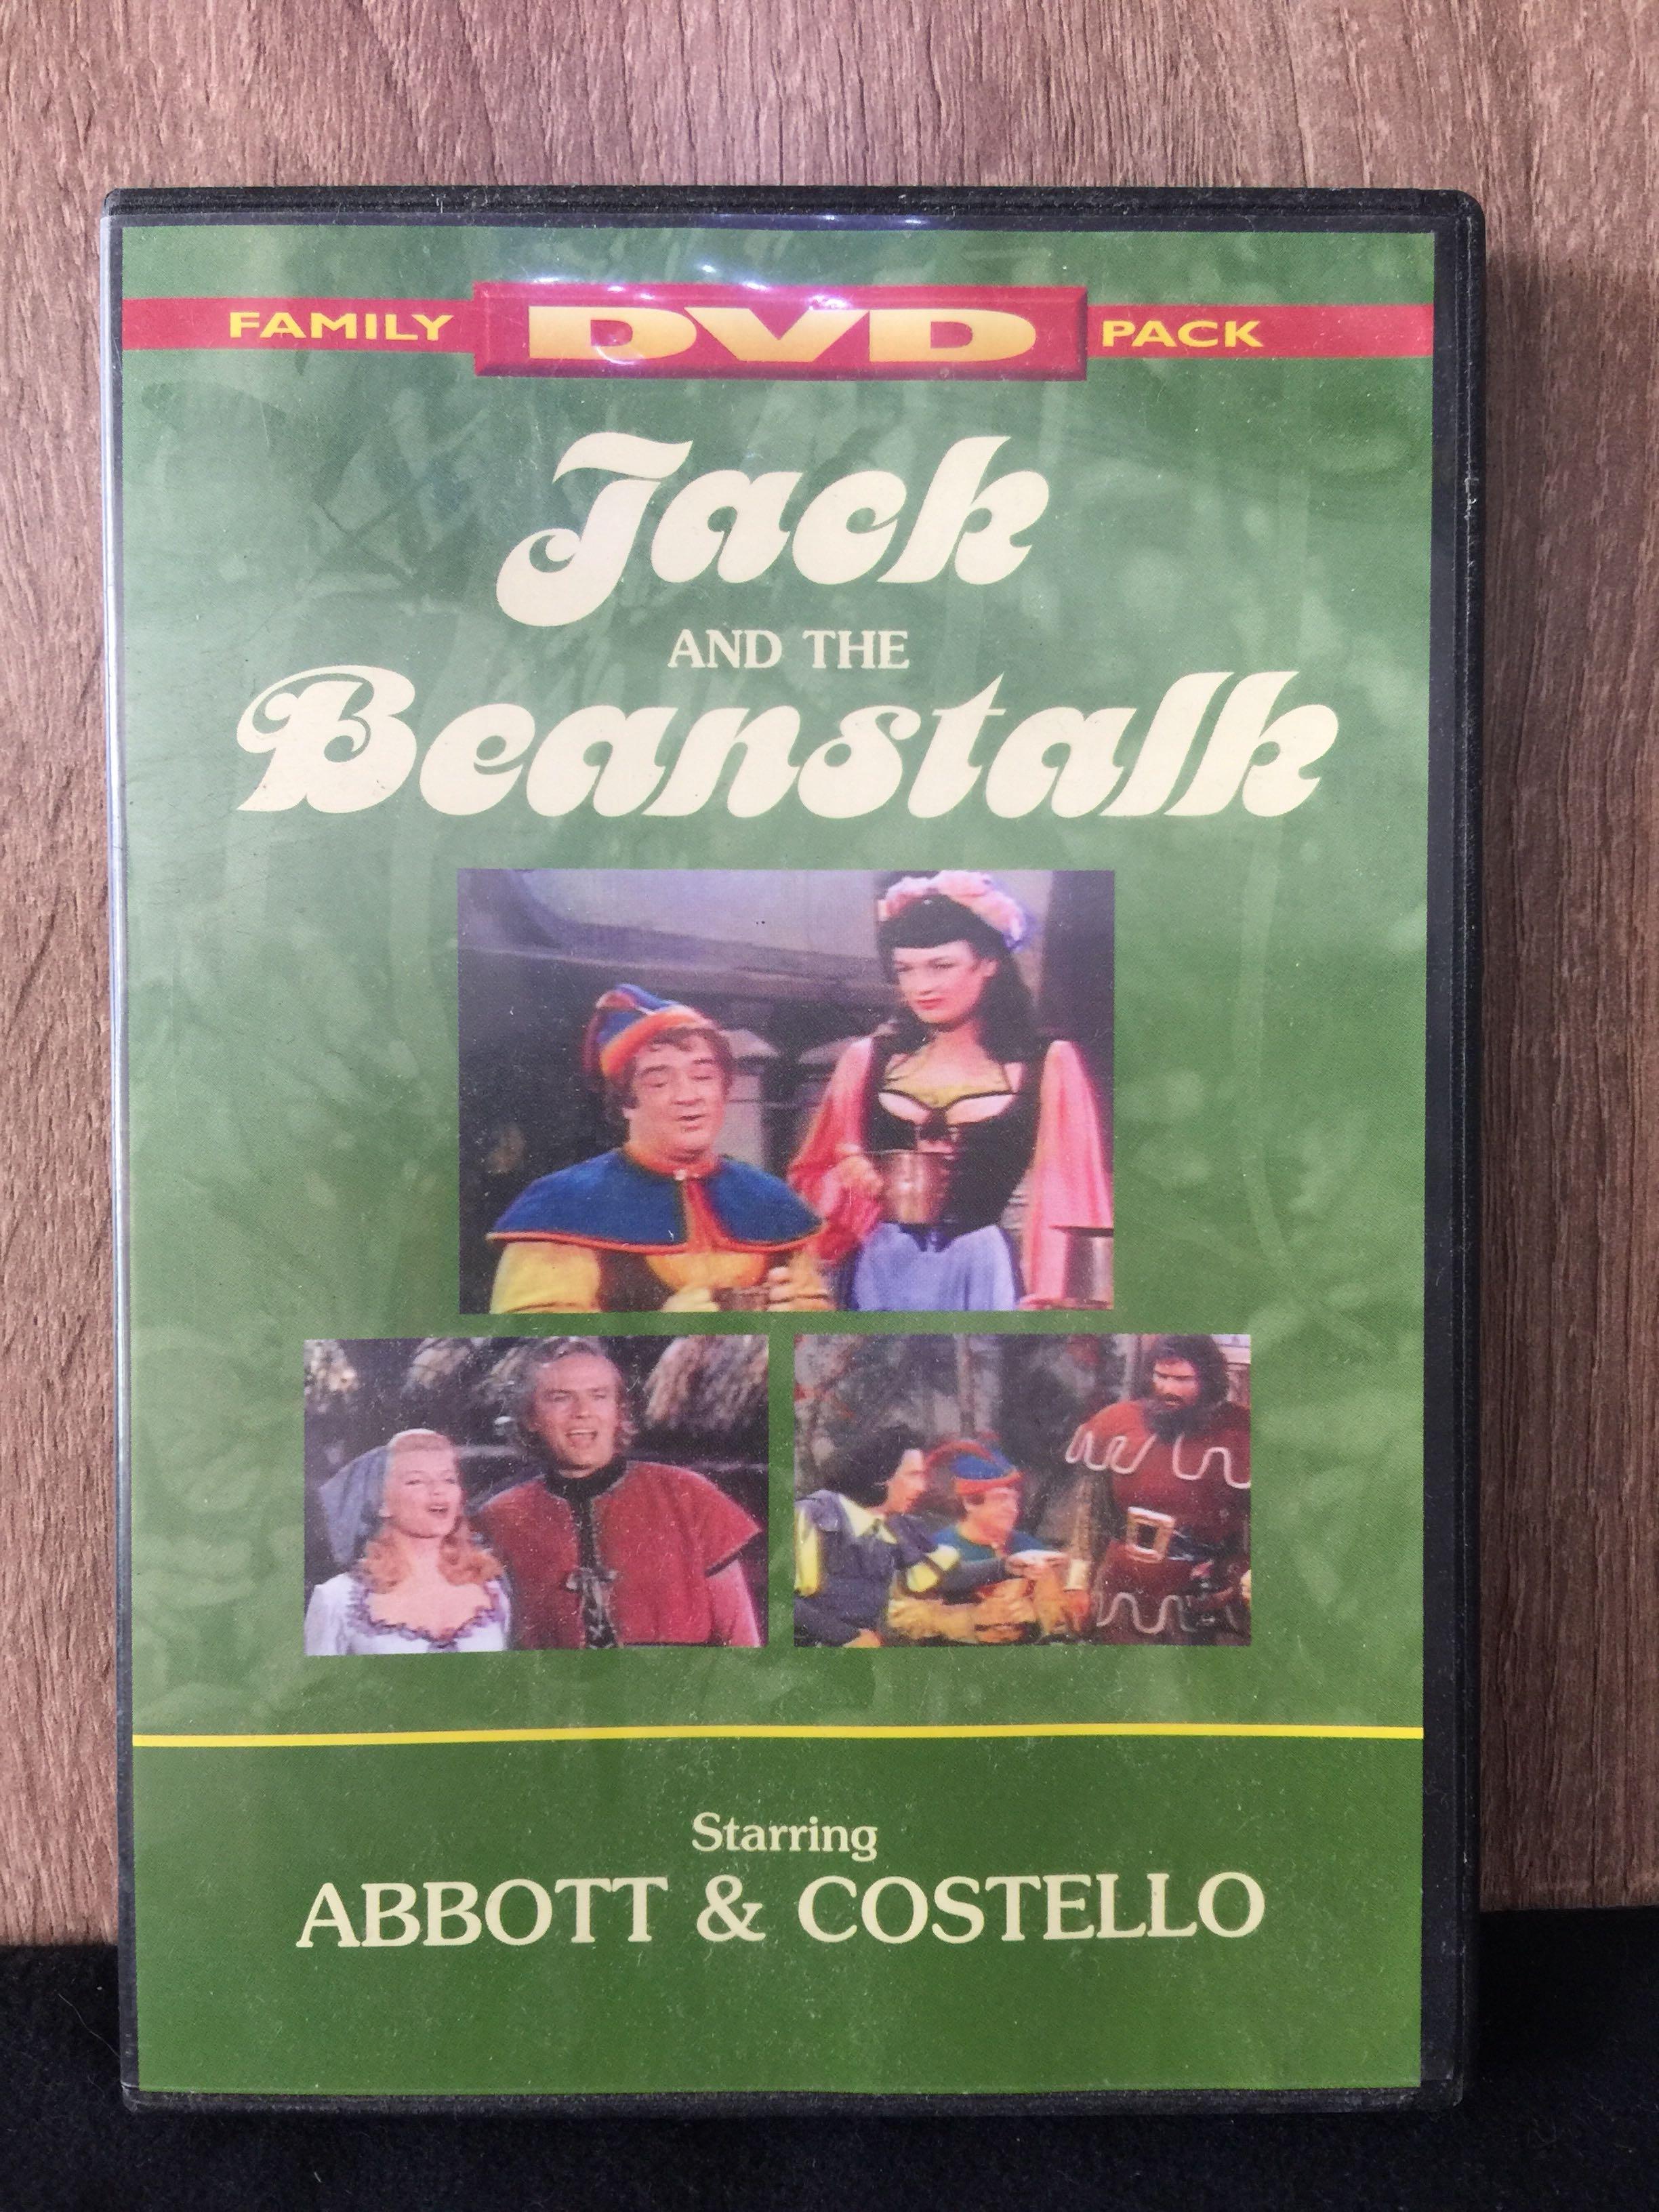 [M088-1] Jack and the Beanstalk starring ABBOTT & COSTELLO DVD